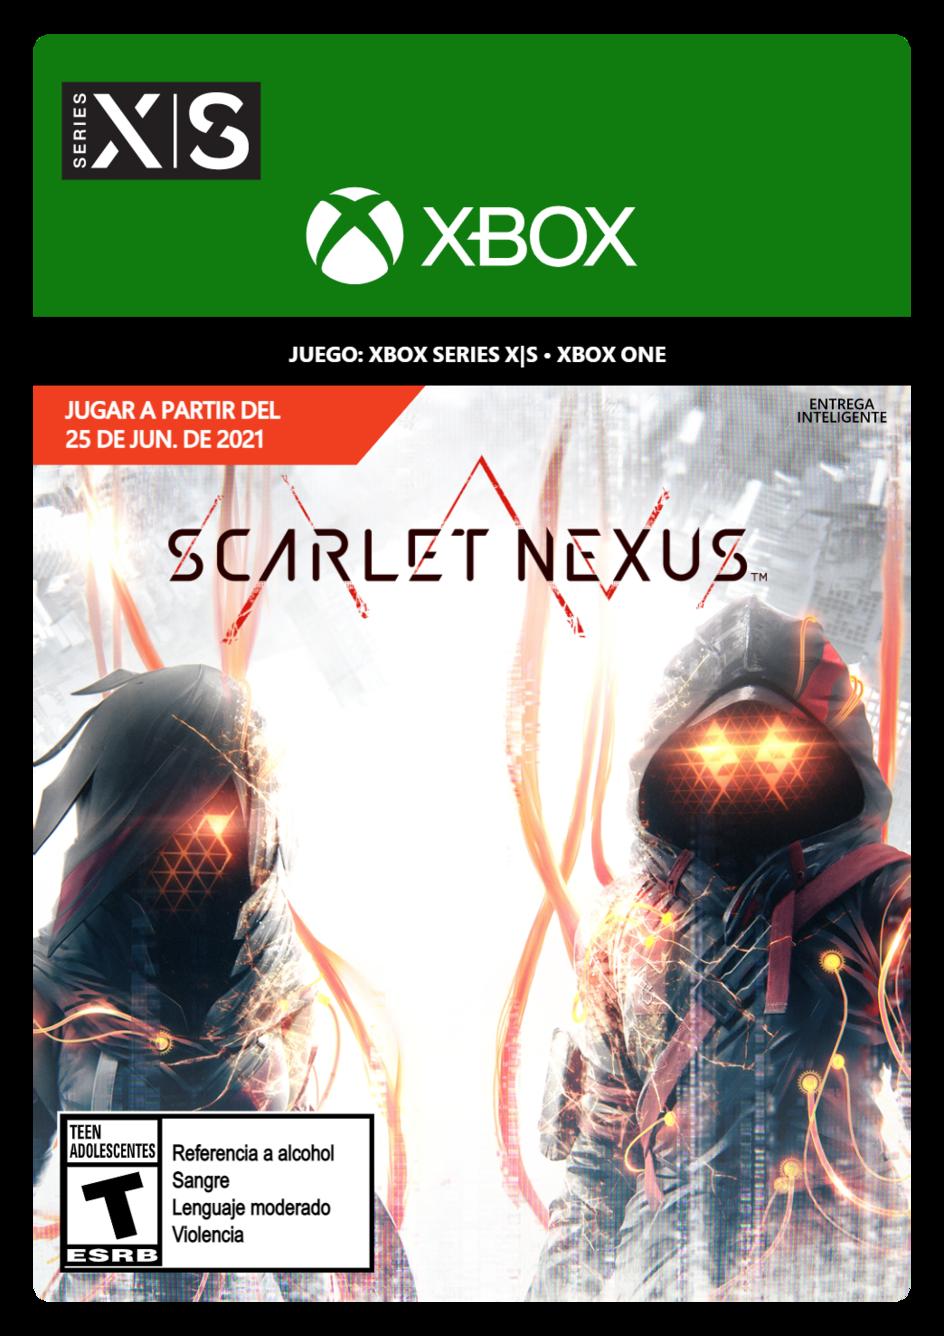 Scarlet Nexus - PRE-PURCHASE